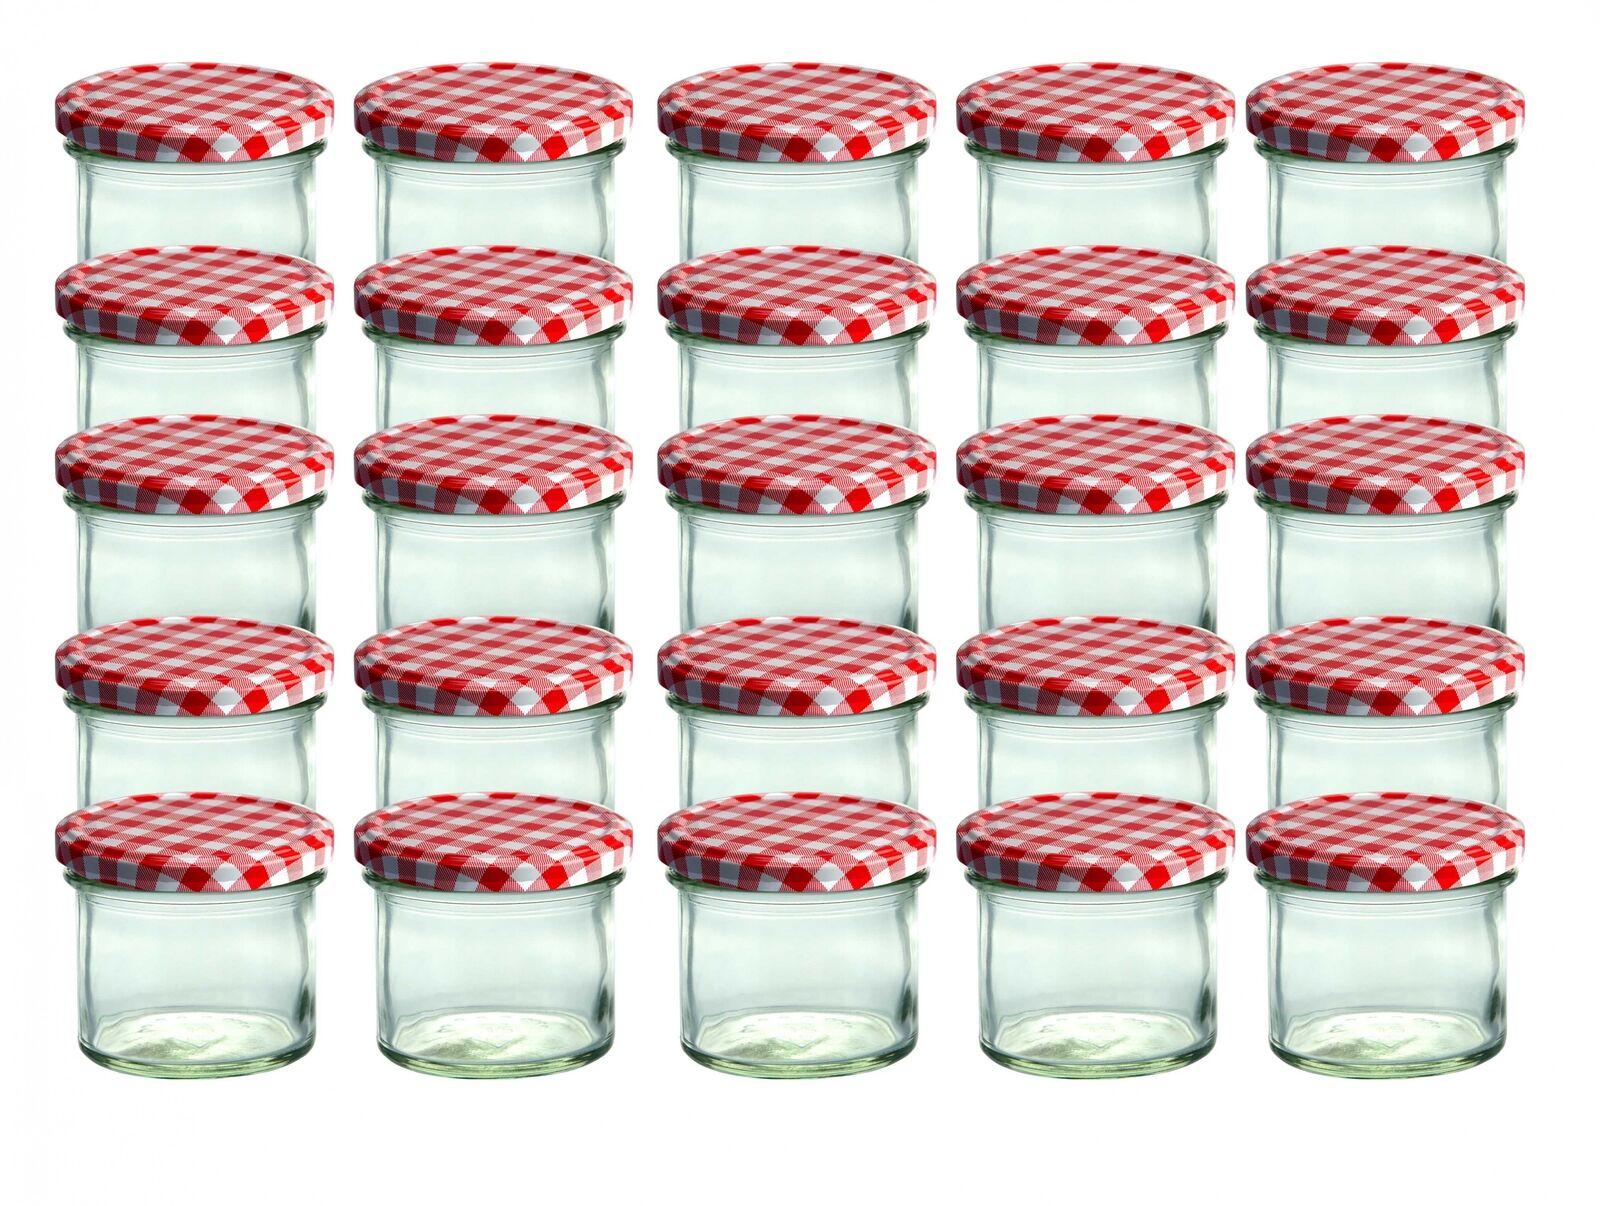 CapCro 25 Sturzgläser 125ml Marmeladenglas Einmachglas Einweckglas roter Deckel